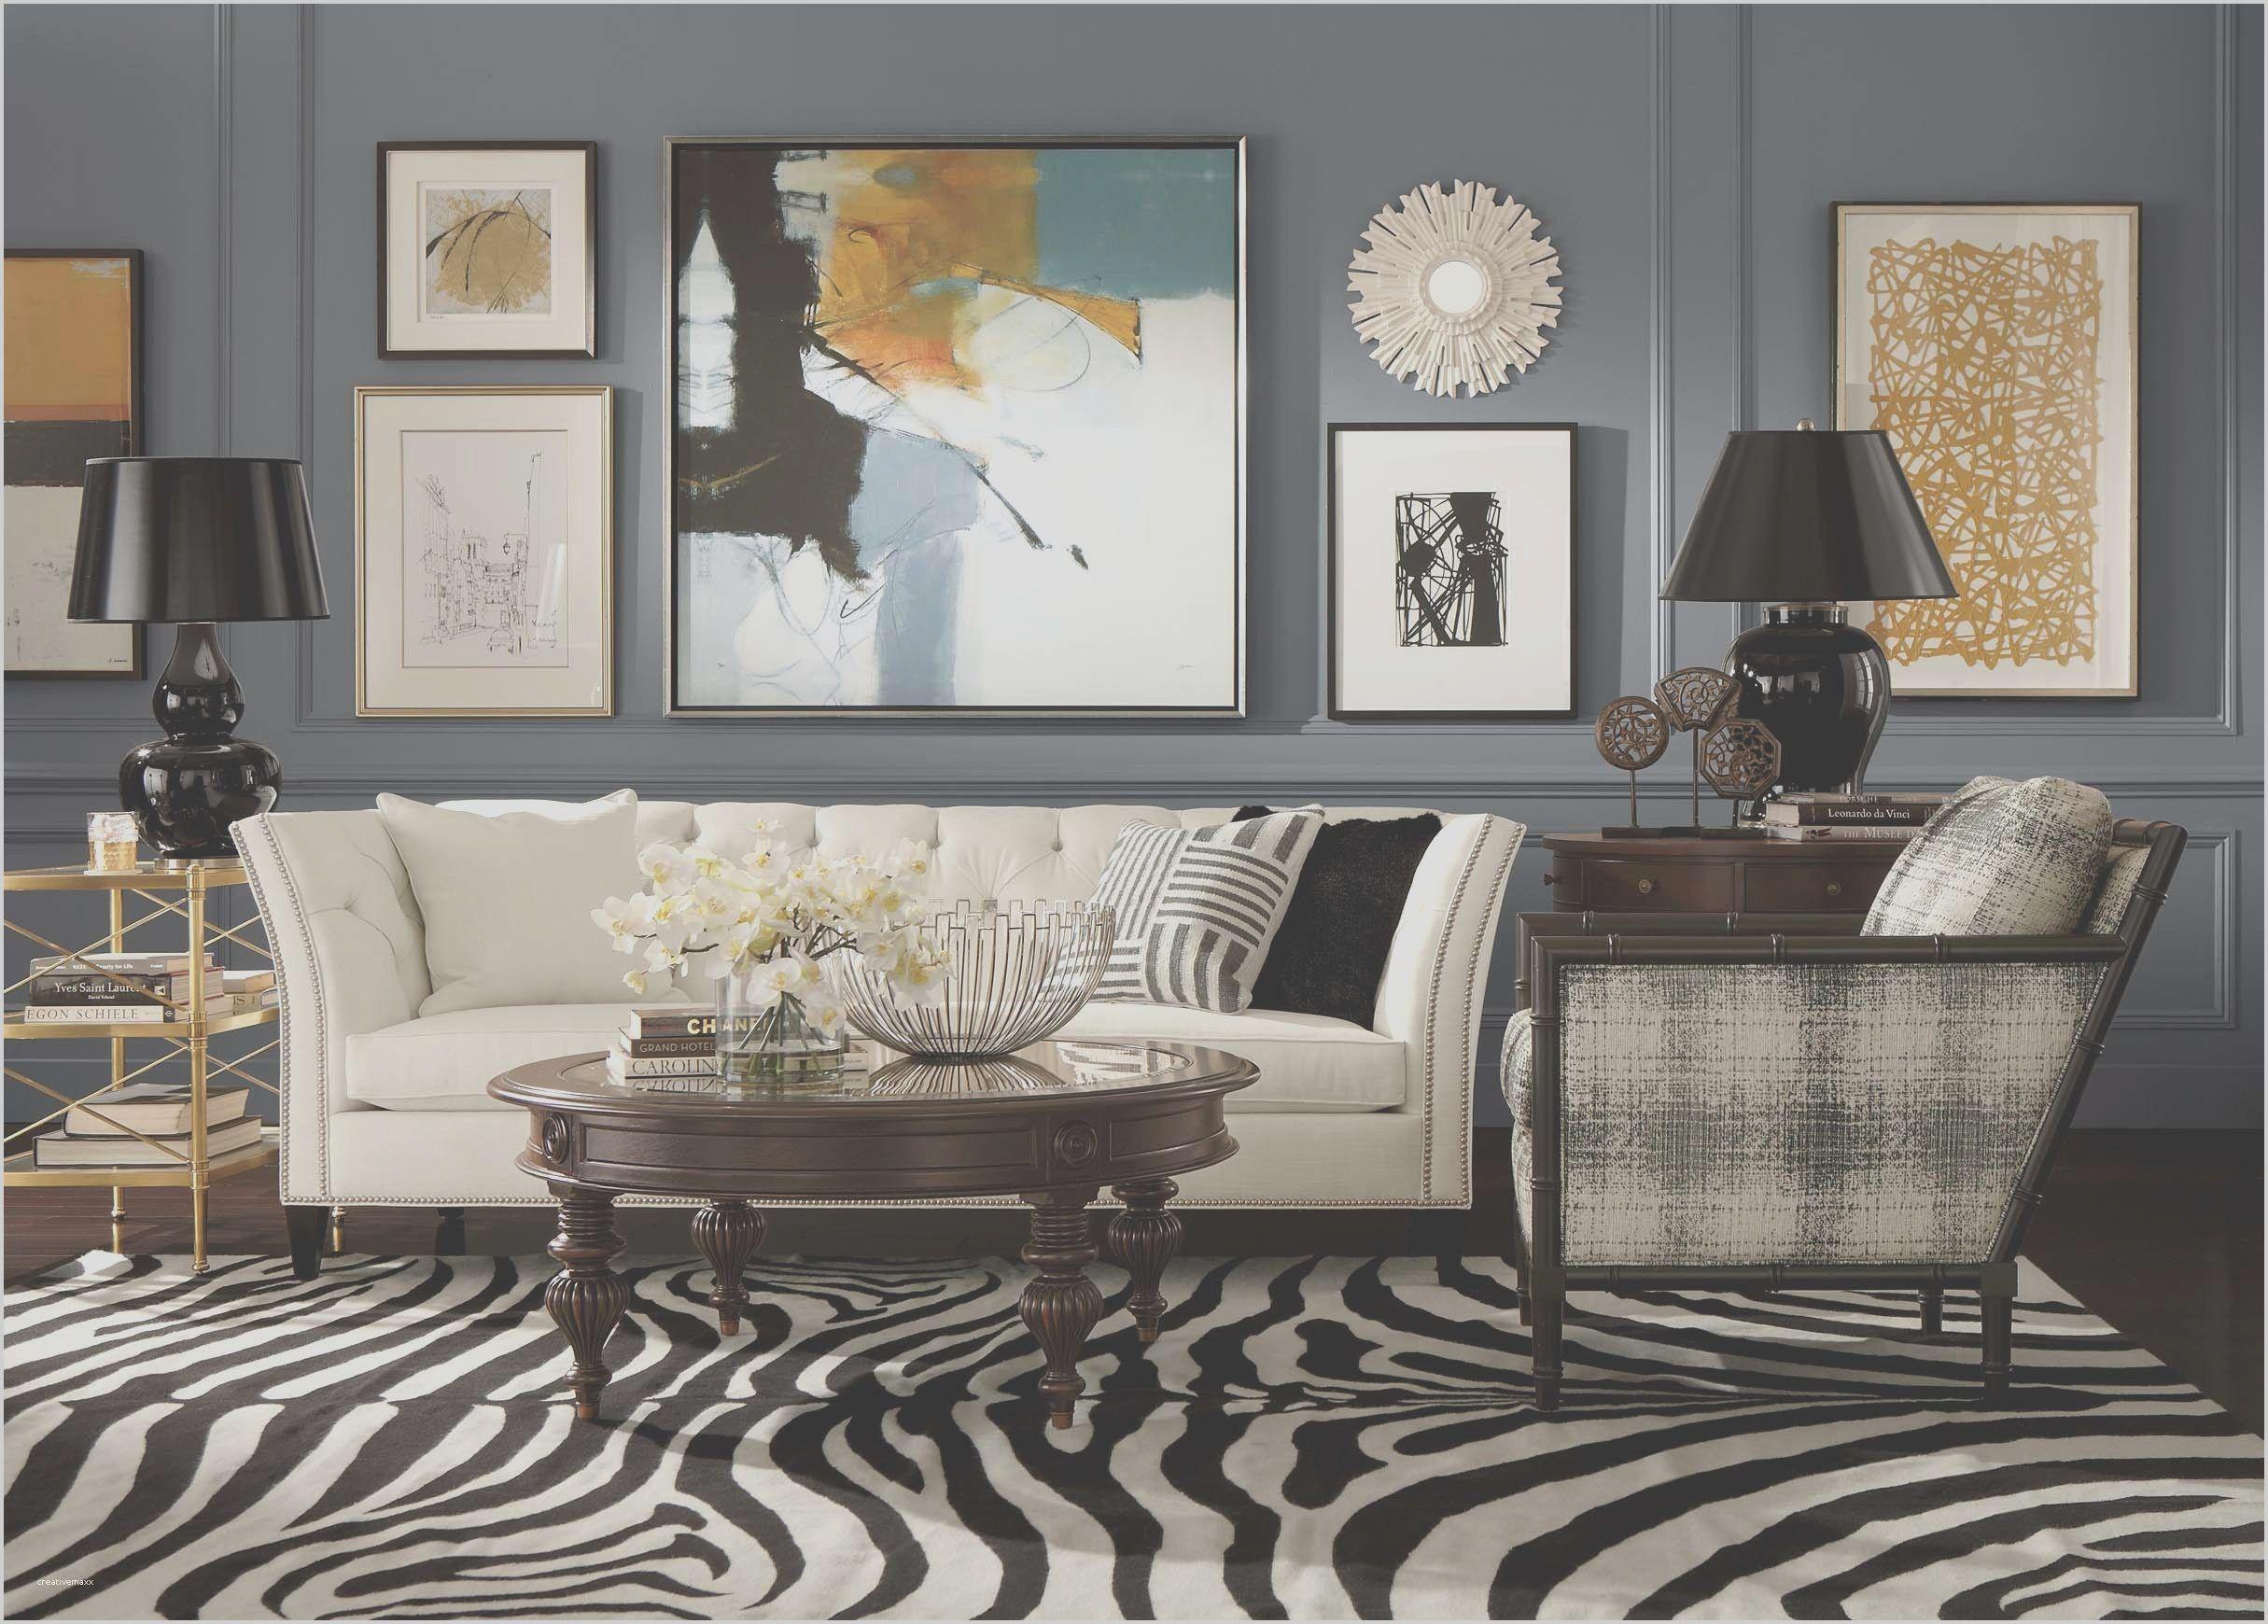 Cheetah Print Living Room Decor Printed Rug Living Room Rugs In Living Room Art Deco Living Room Living room ideas zebra